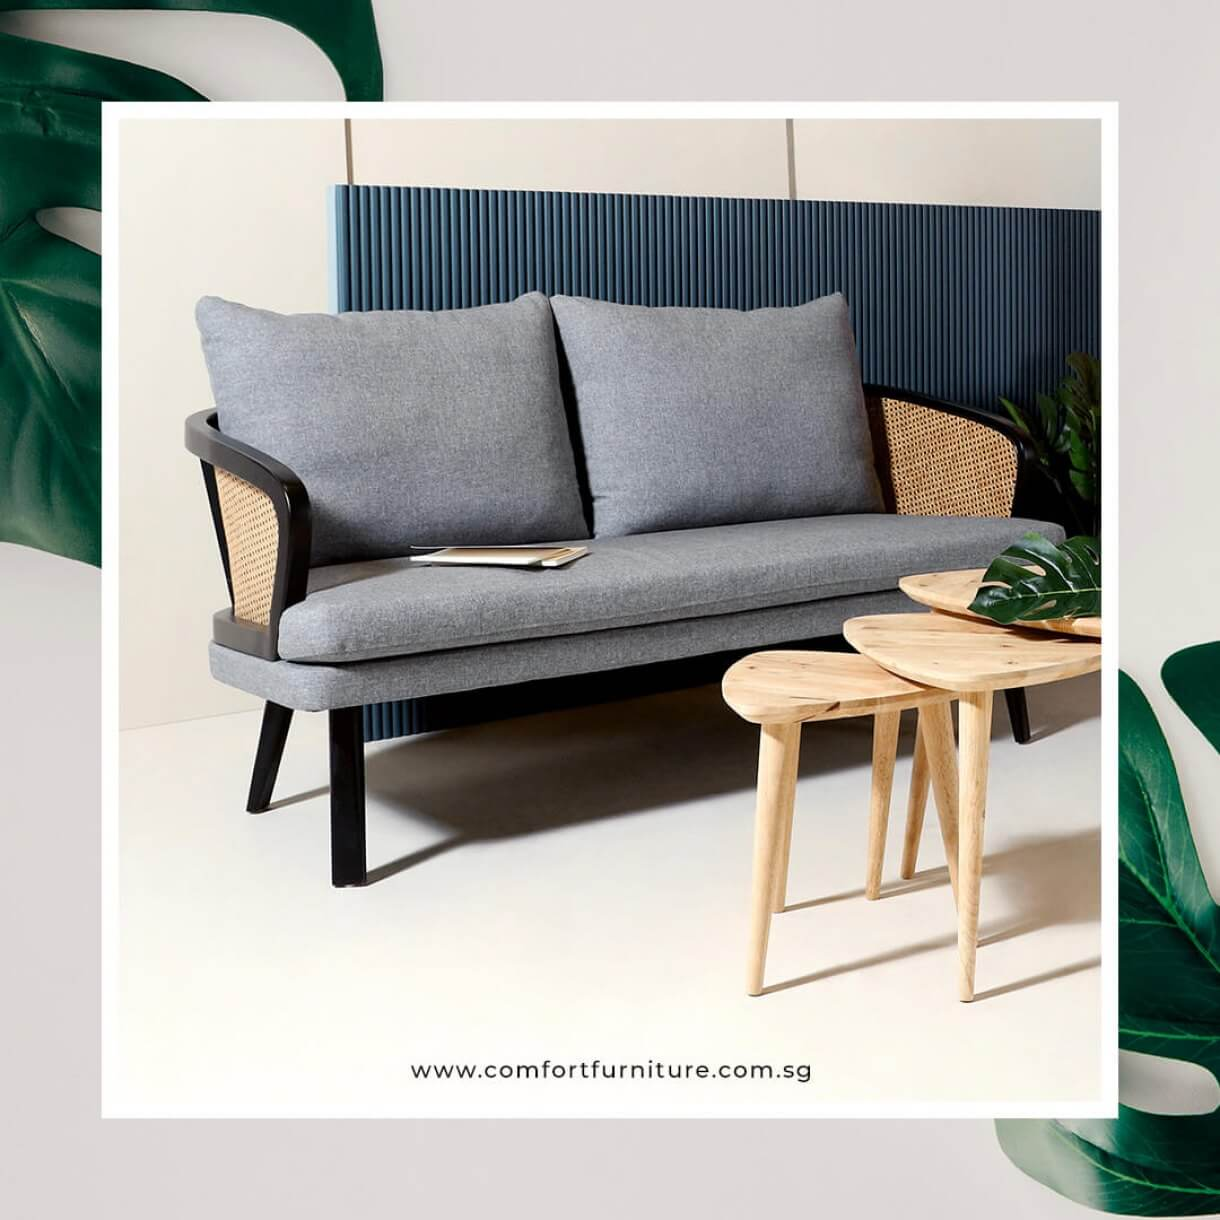 Keep Up with Interior Design Trend with Rafael Rattan Sofa - Comfort Furniture